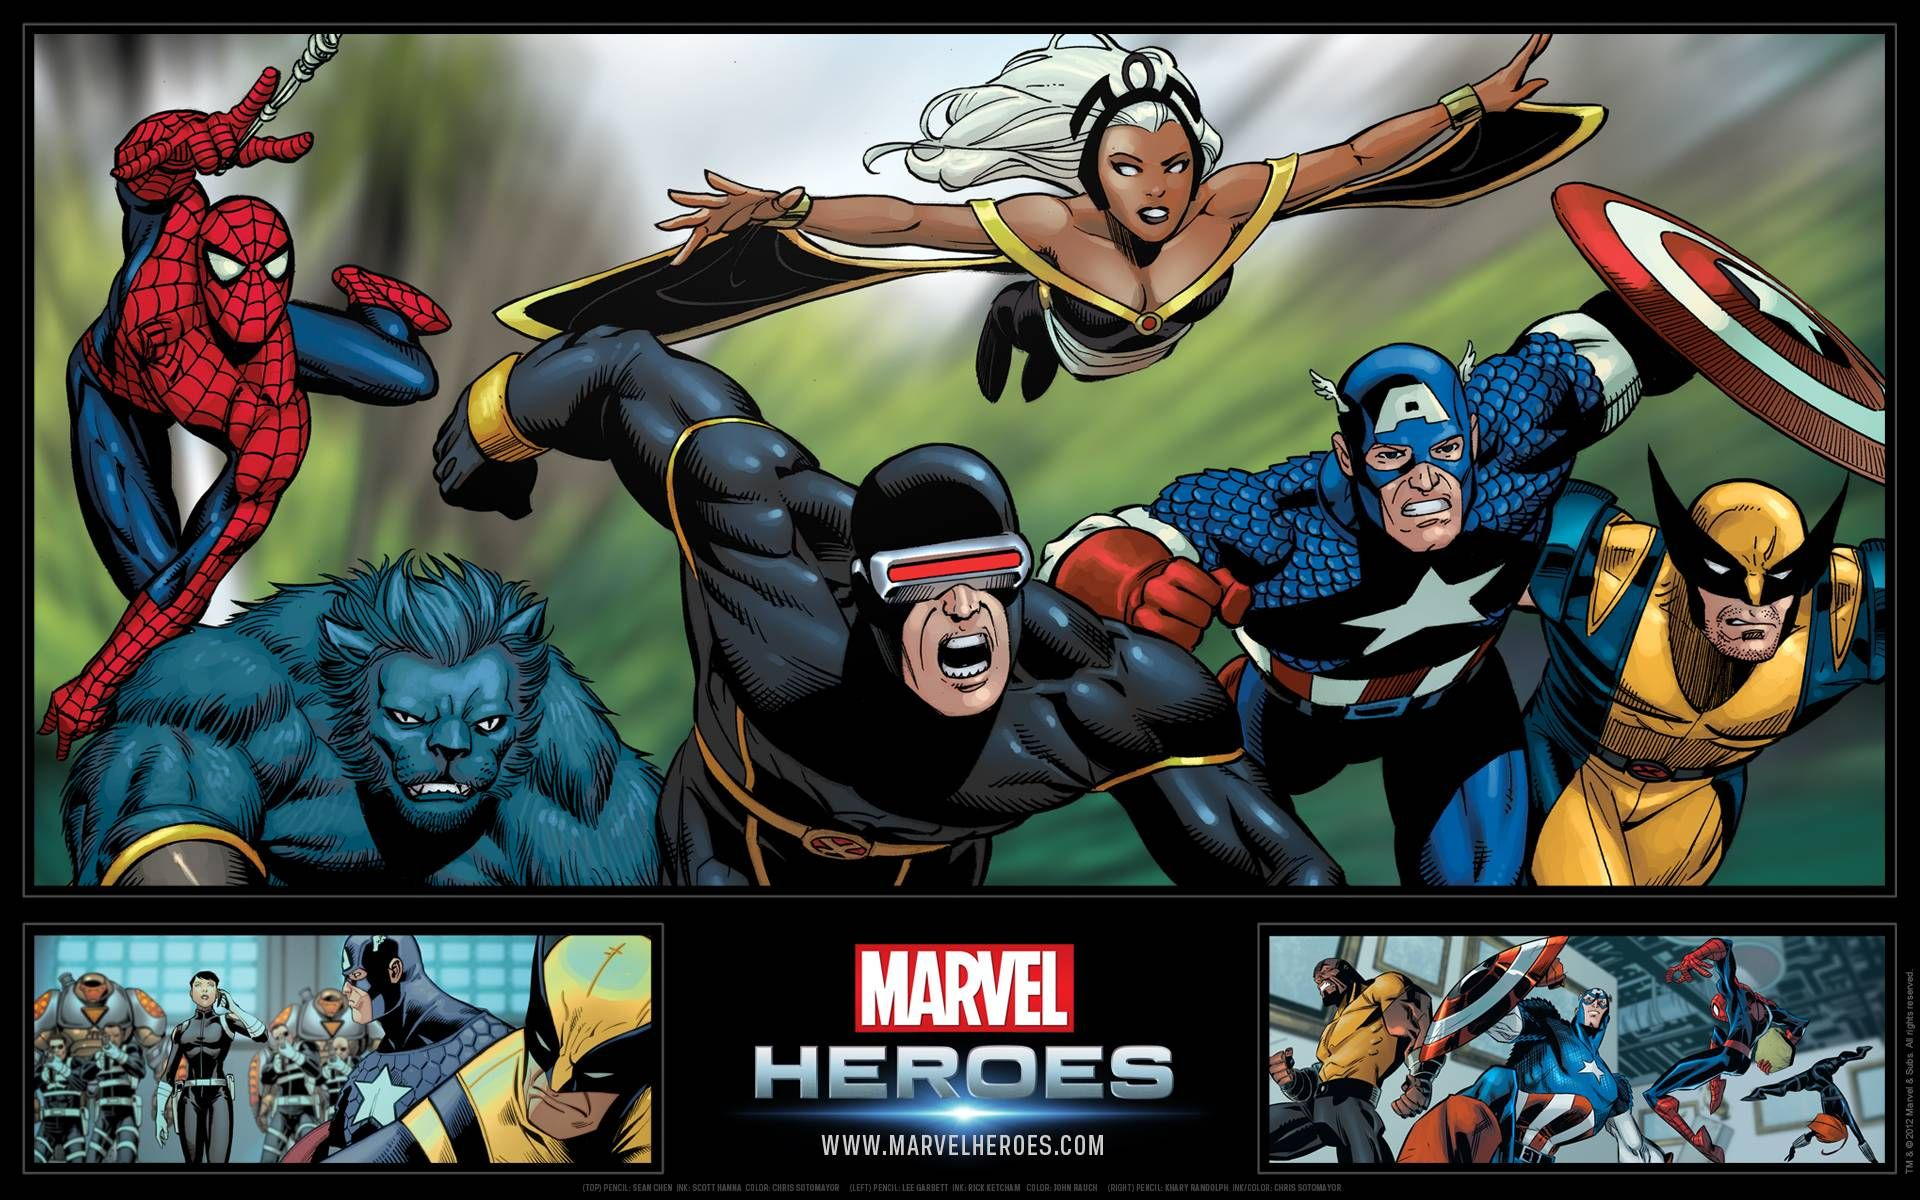 Marvel heroes hd wallpapers download free marvel heroes tumblr marvel heroes hd wallpapers download free marvel heroes tumblr voltagebd Images